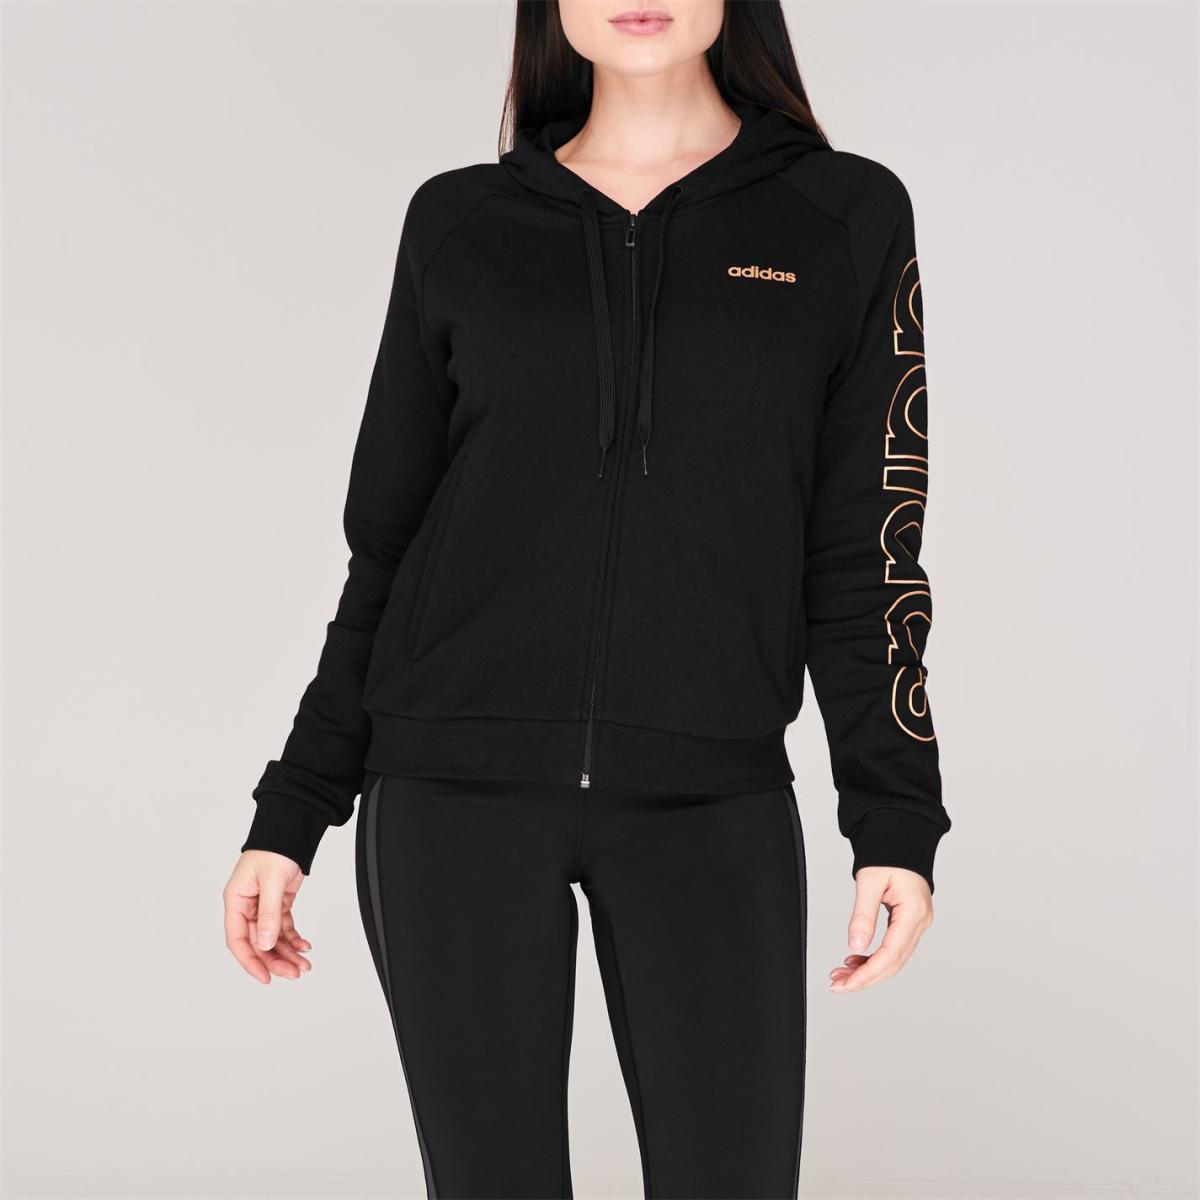 adidas Essential Kapuzenjacke Jacke Kapuzenpullover Damen Sweatshirt Pullover 23